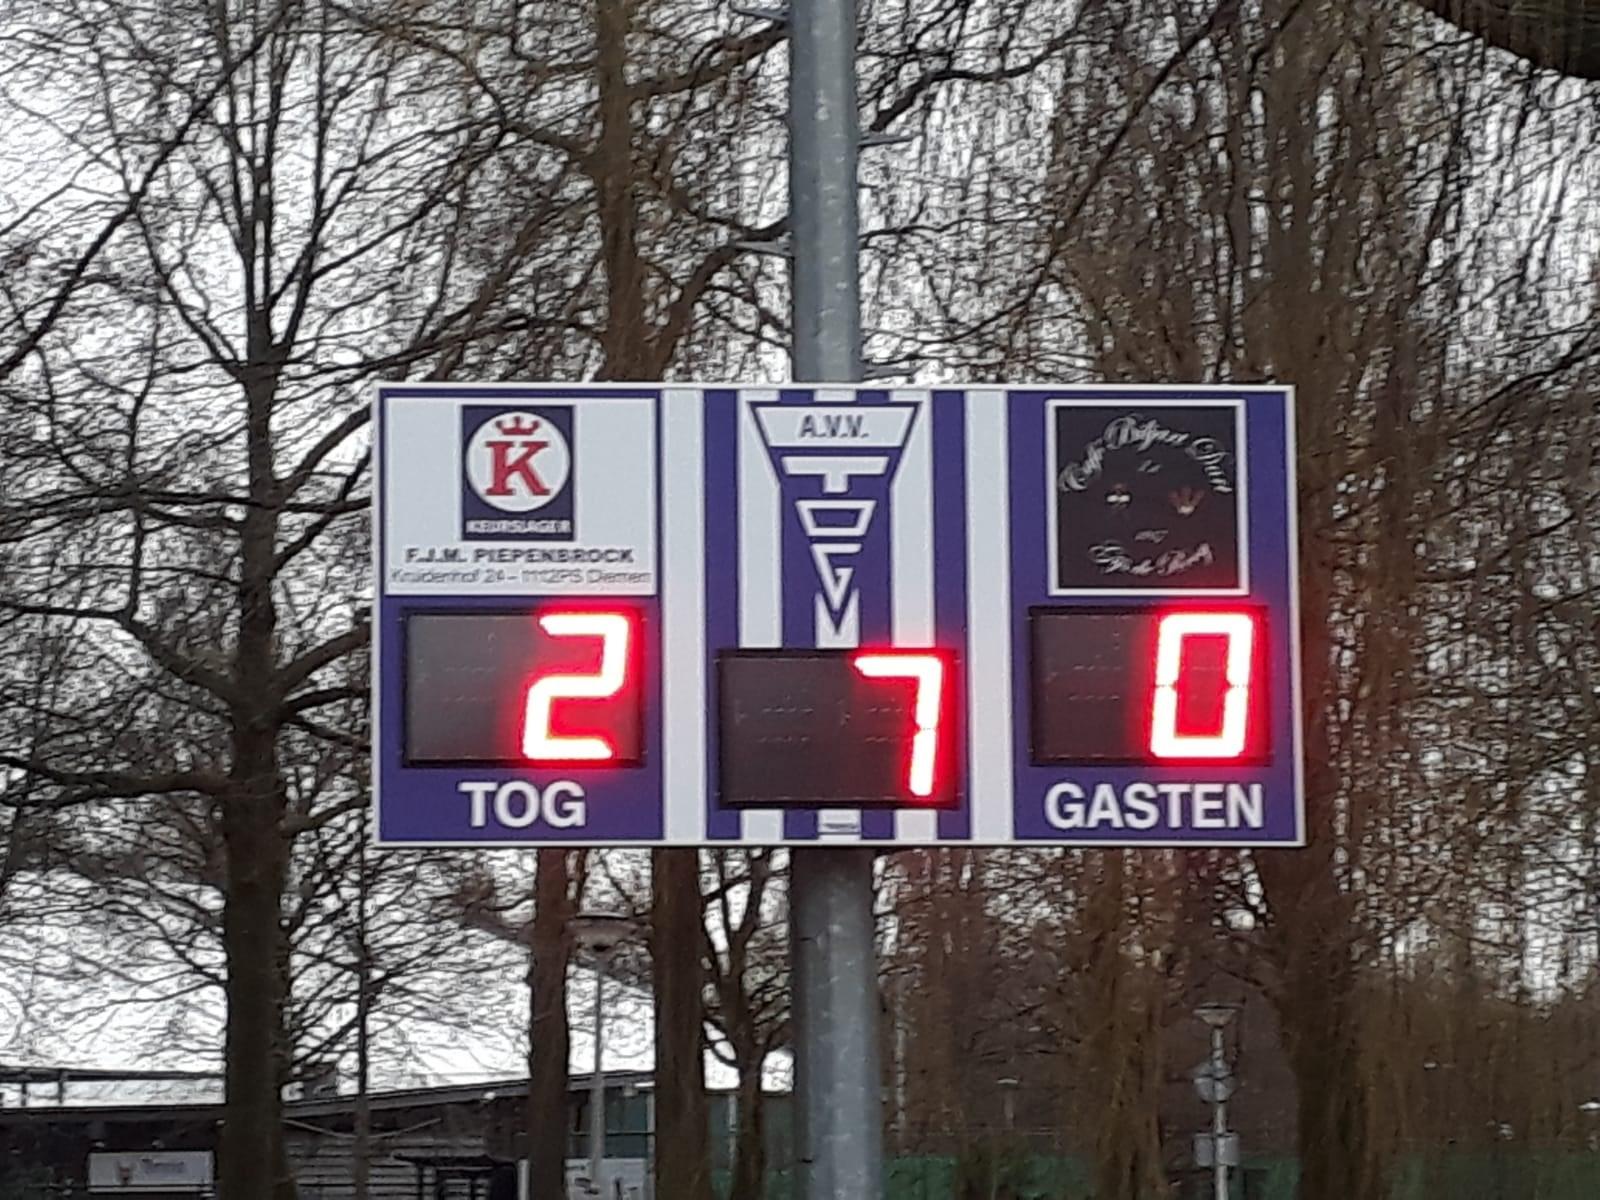 scorebord voetbal scoretec avv tog